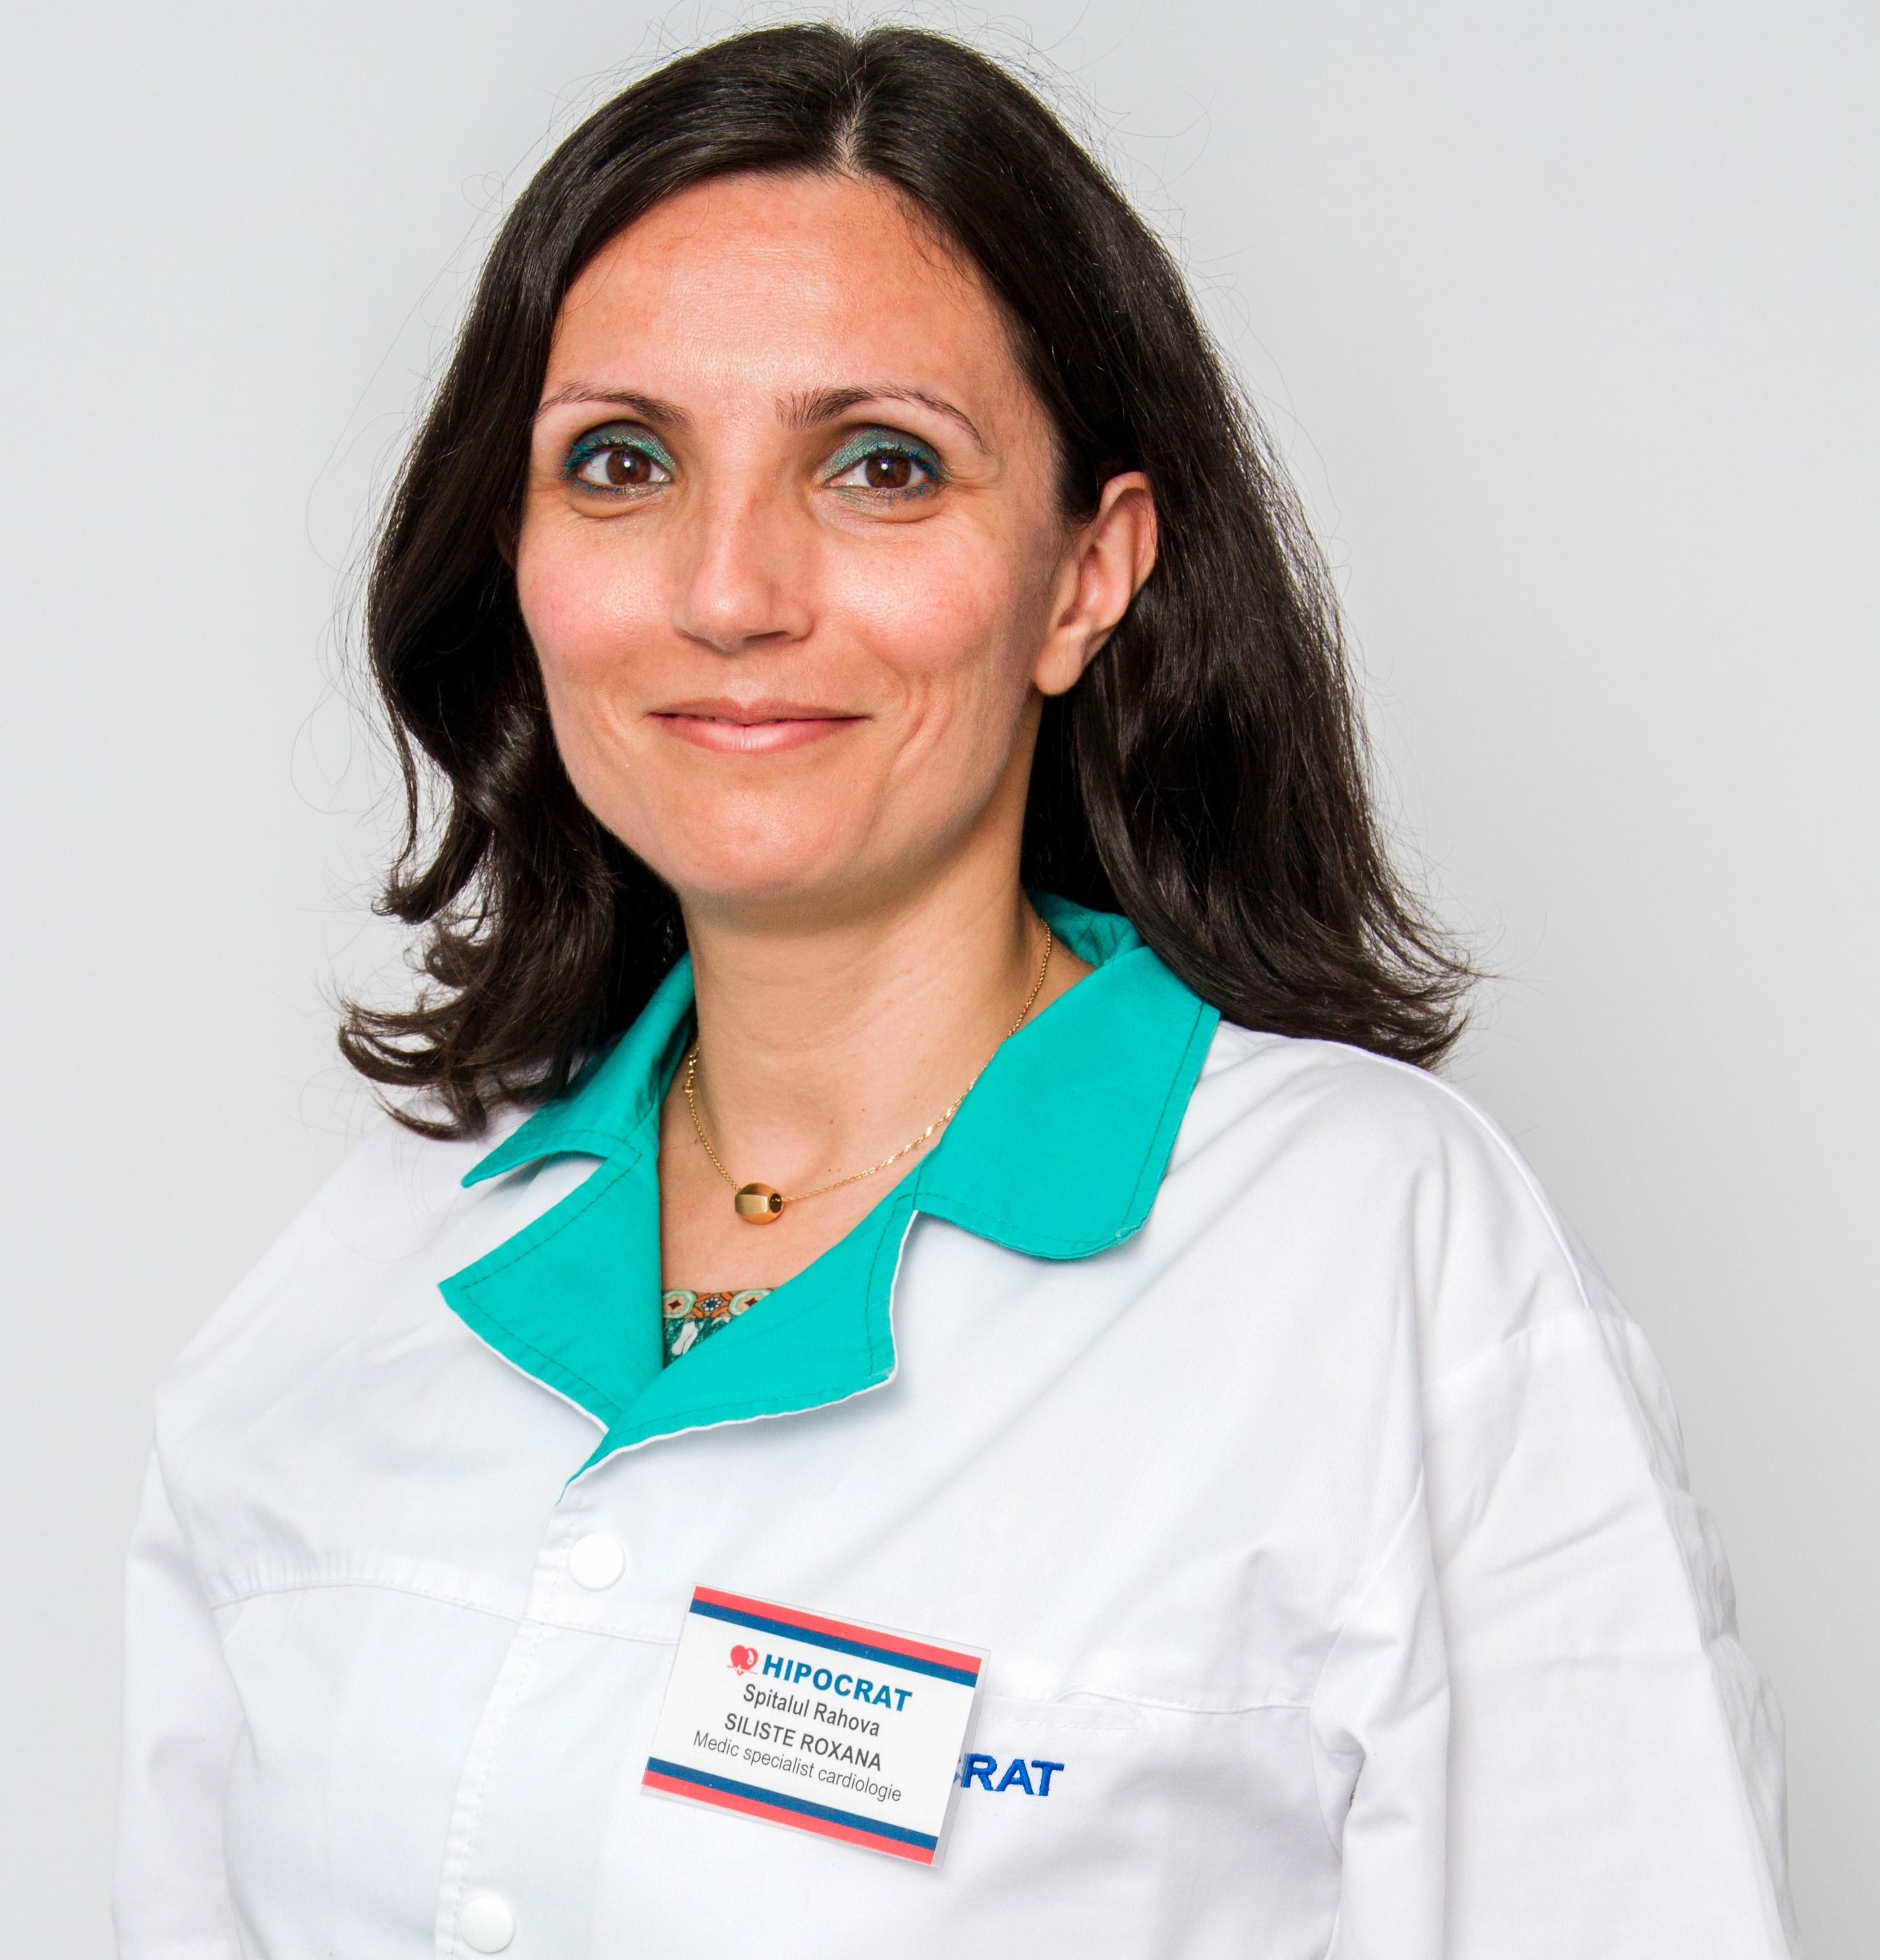 Dr. Roxana Nicoleta-Siliste